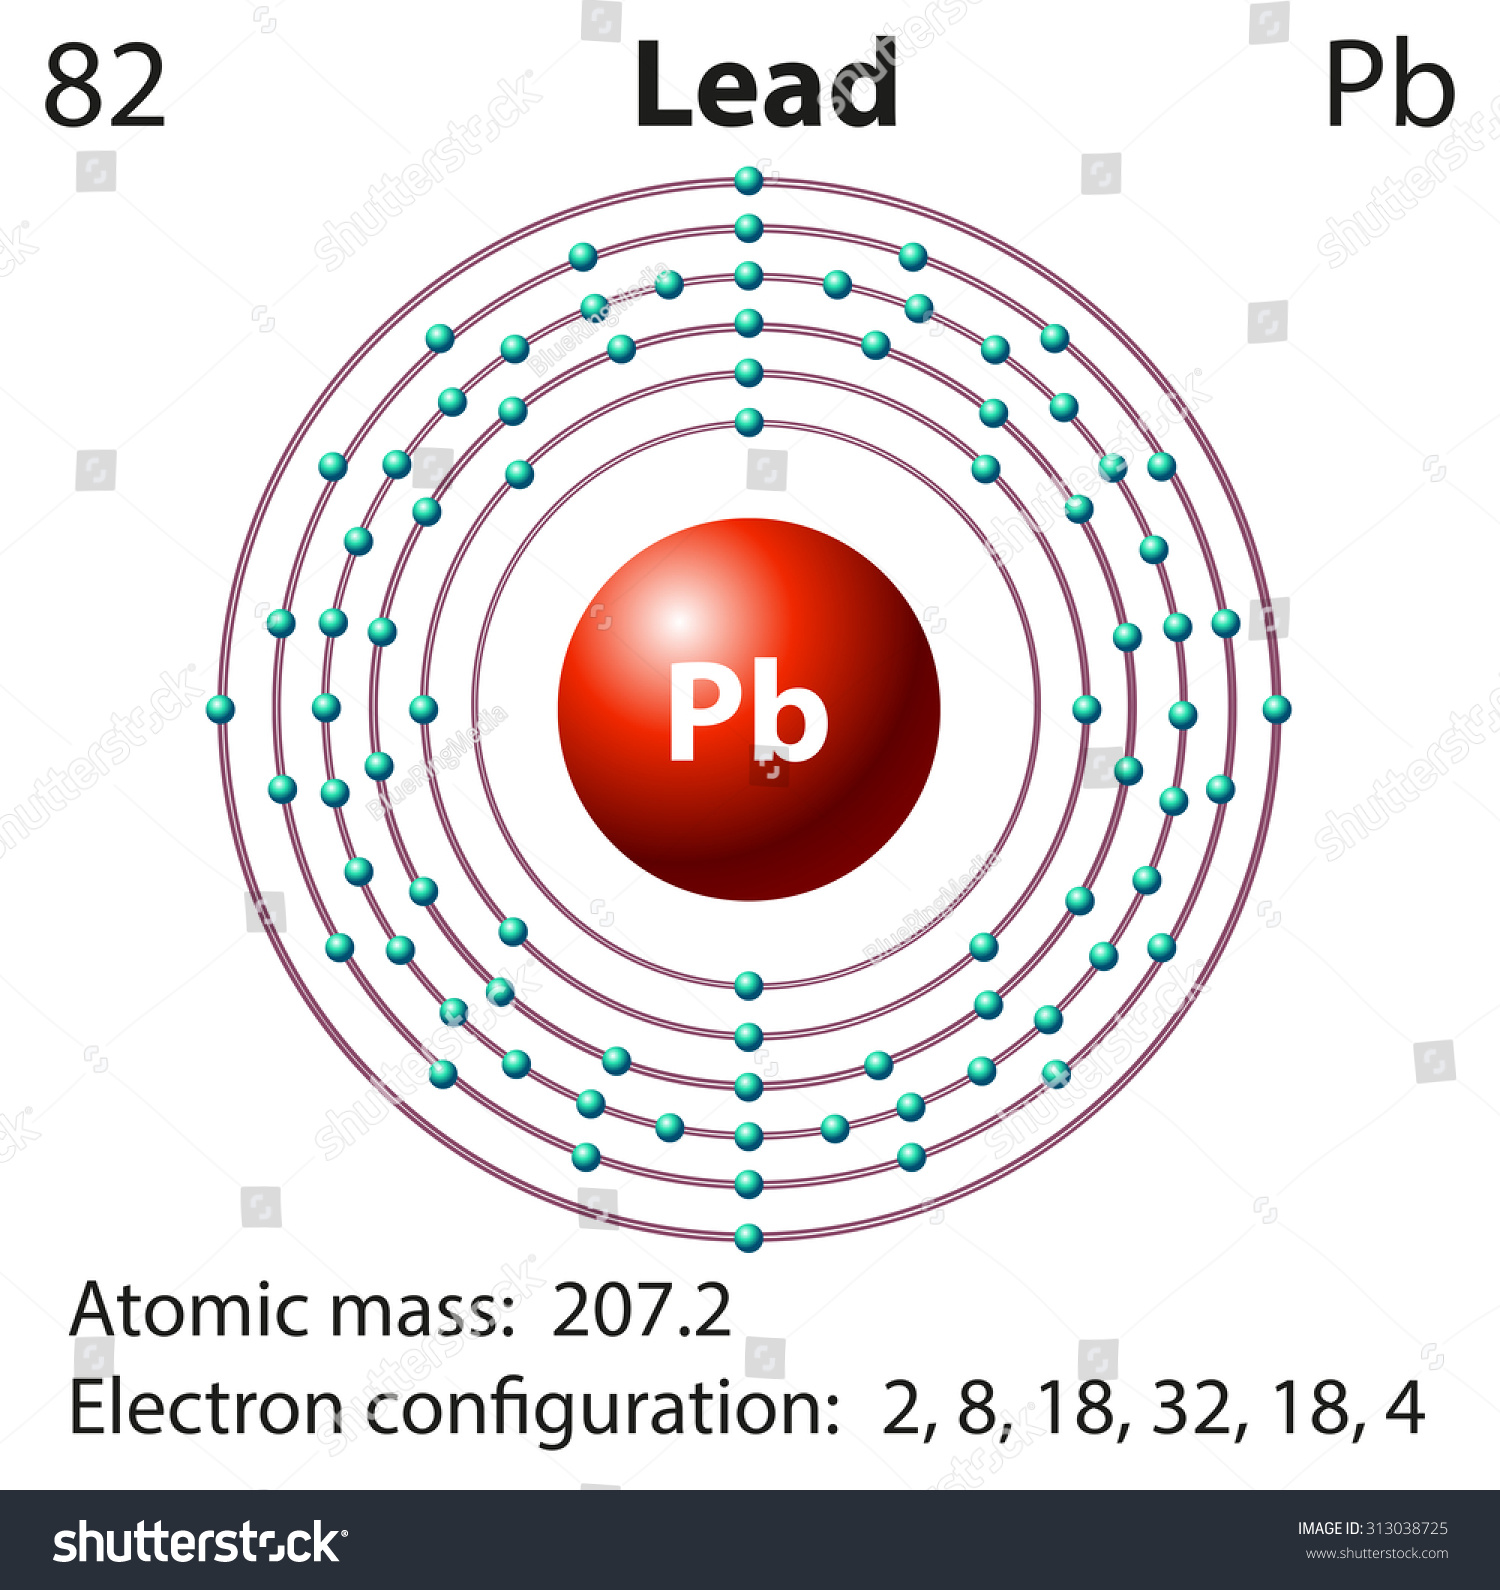 Diagram representation element lead illustration stock vector diagram representation of the element lead illustration pooptronica